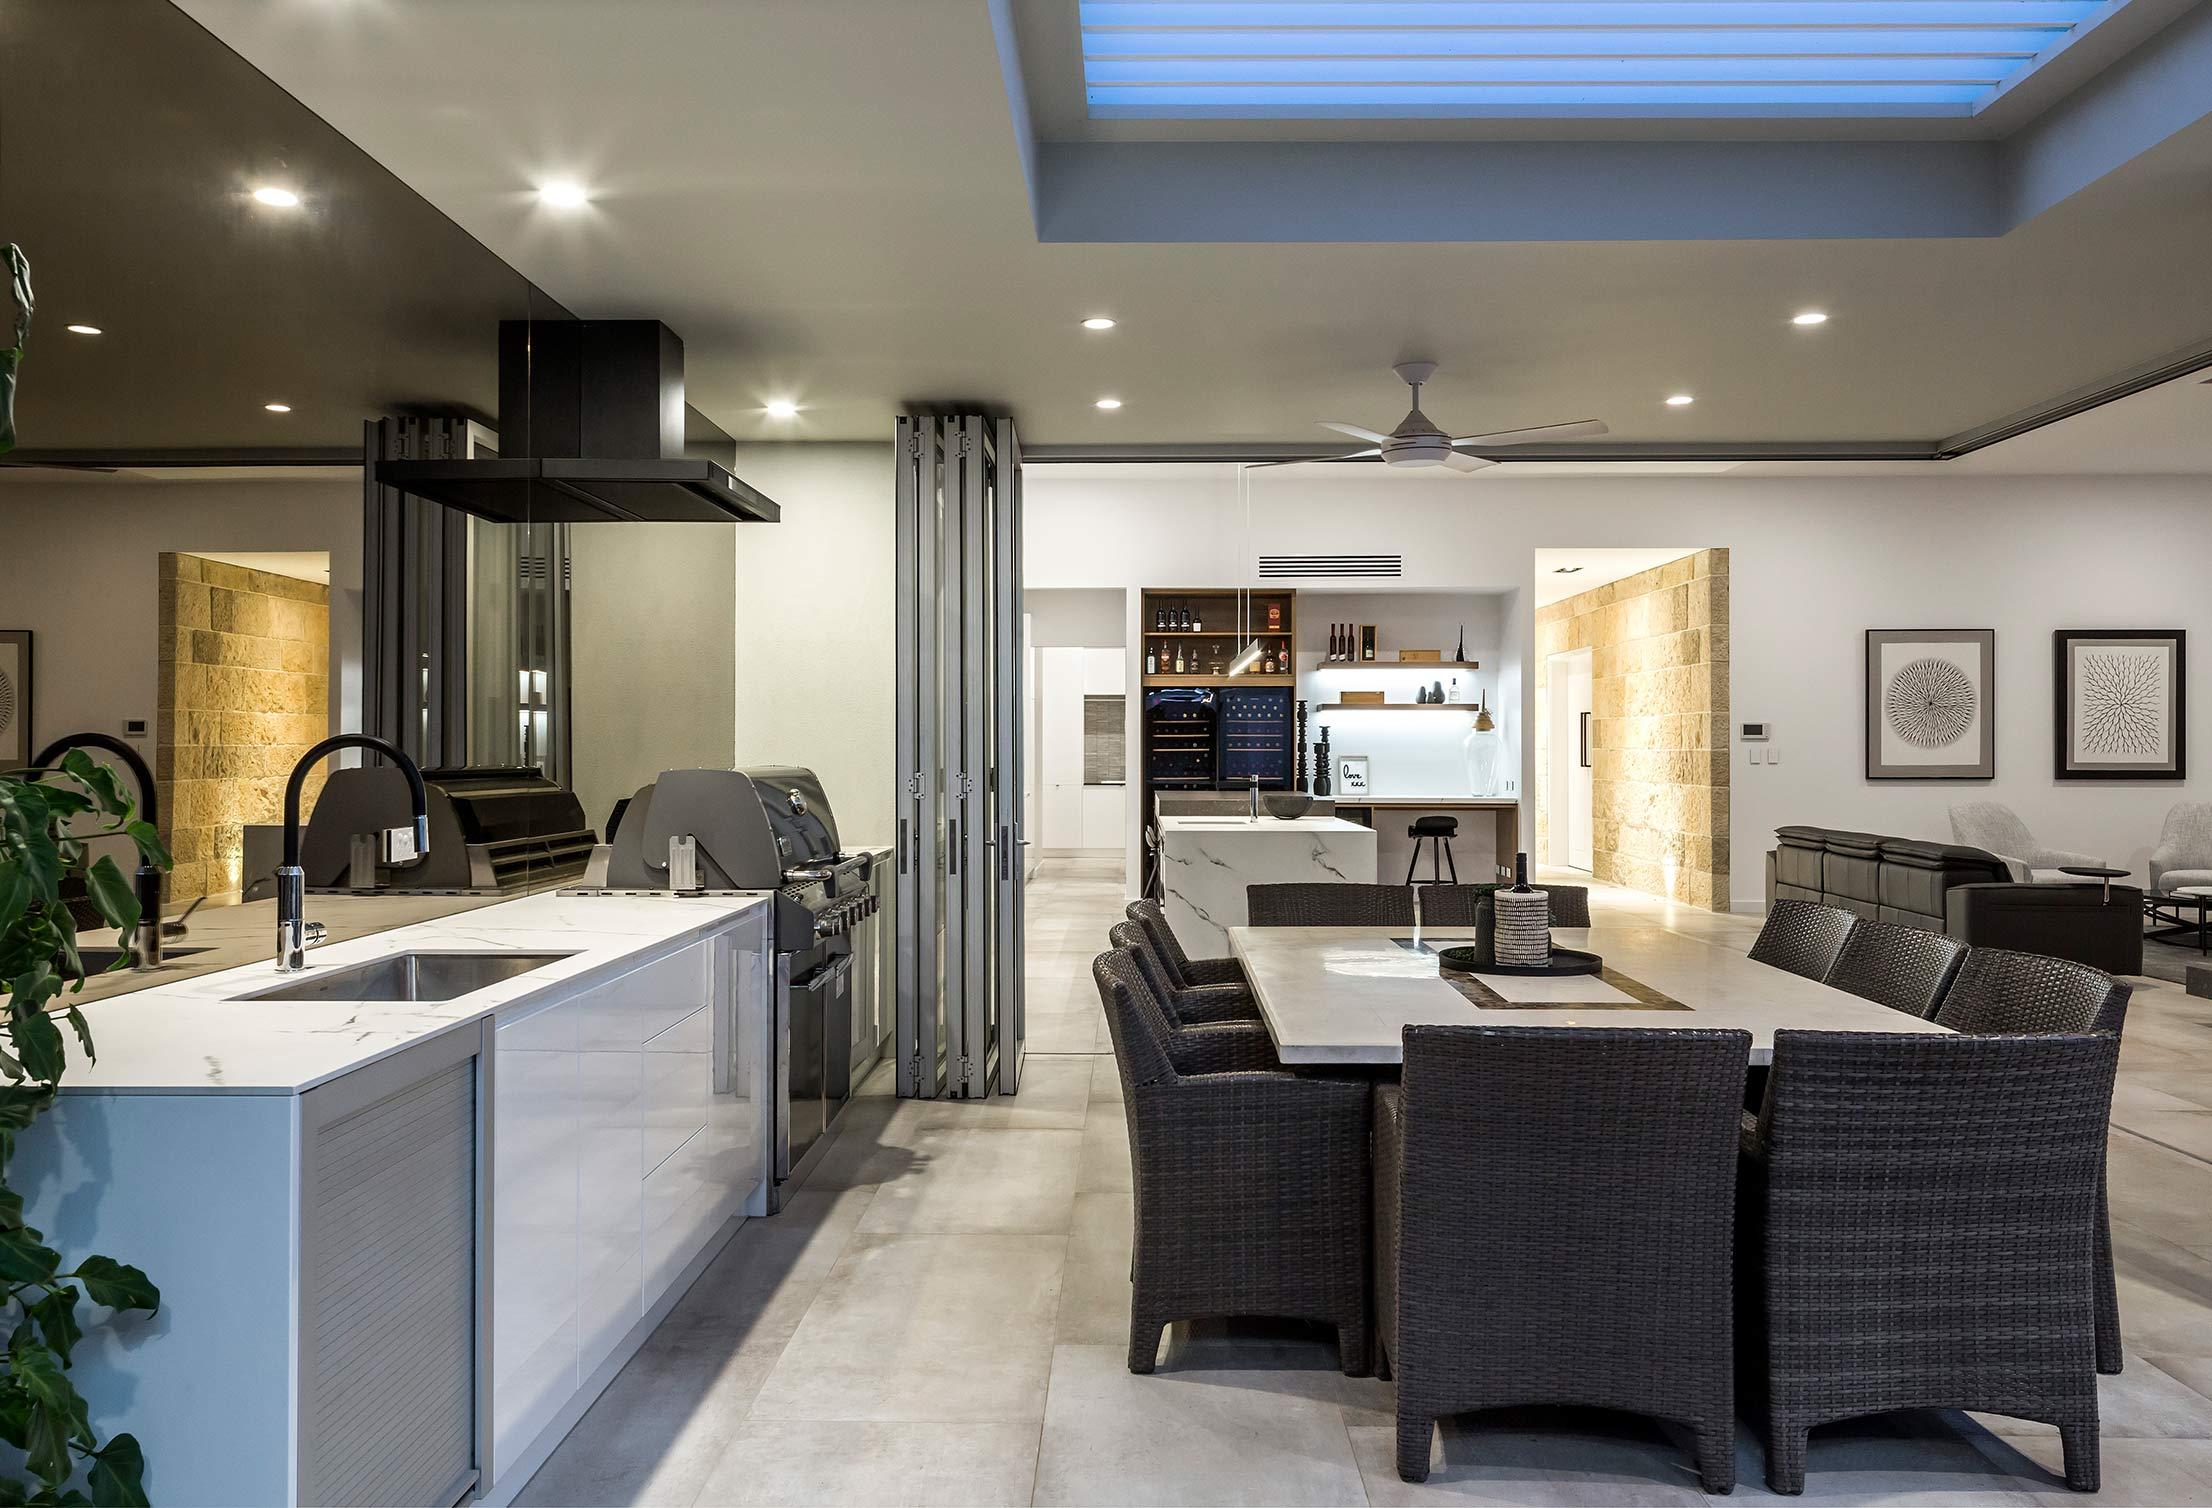 turnbull-built-outdoor-kitchen-soerton-park-sa.jpg